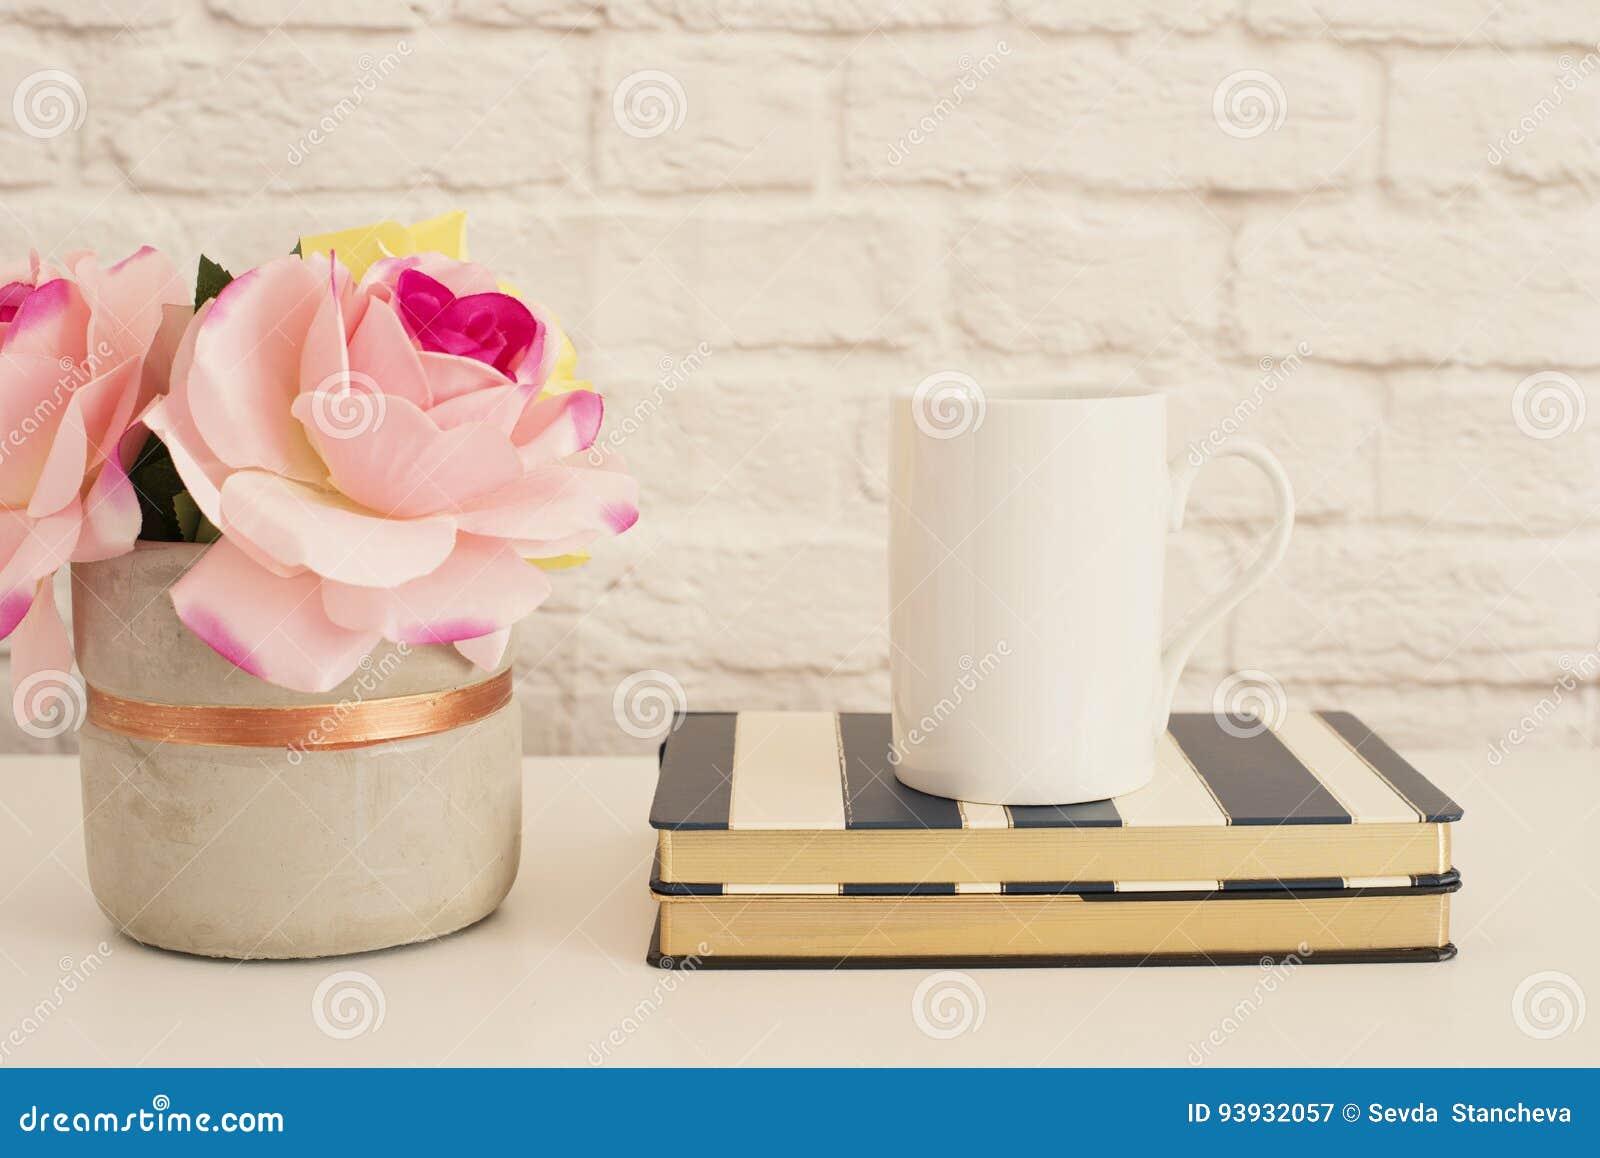 White Mug Mockup. Blank White Coffee Mug Mock Up. Styled Photography. Coffee Cup Product Display. Coffee Mug On Striped Design Not